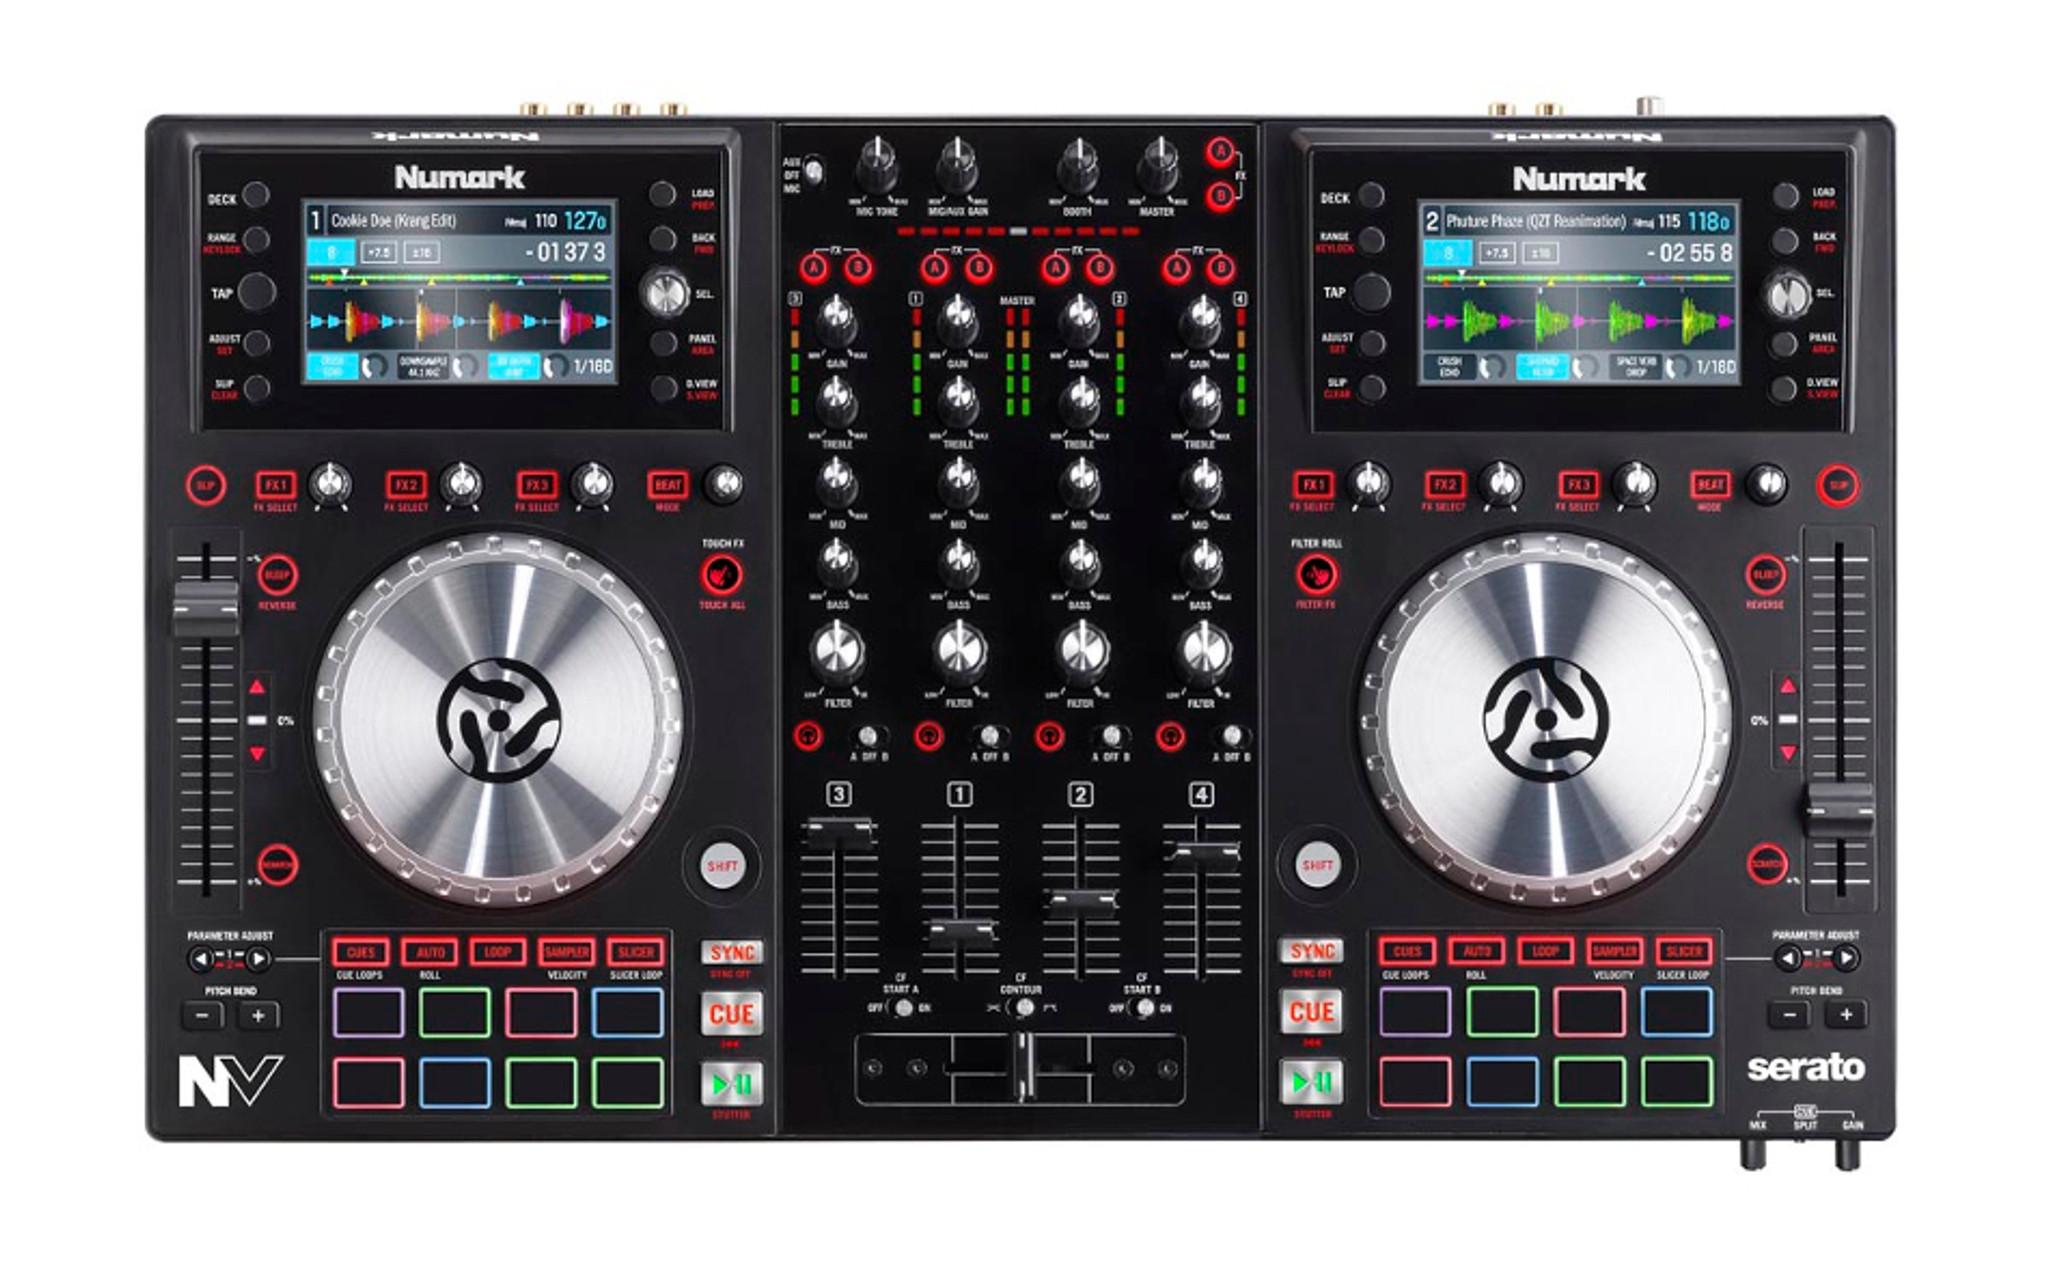 Numark NV 4-Channel Serato DJ Controller w/ 16 Trigger Pads